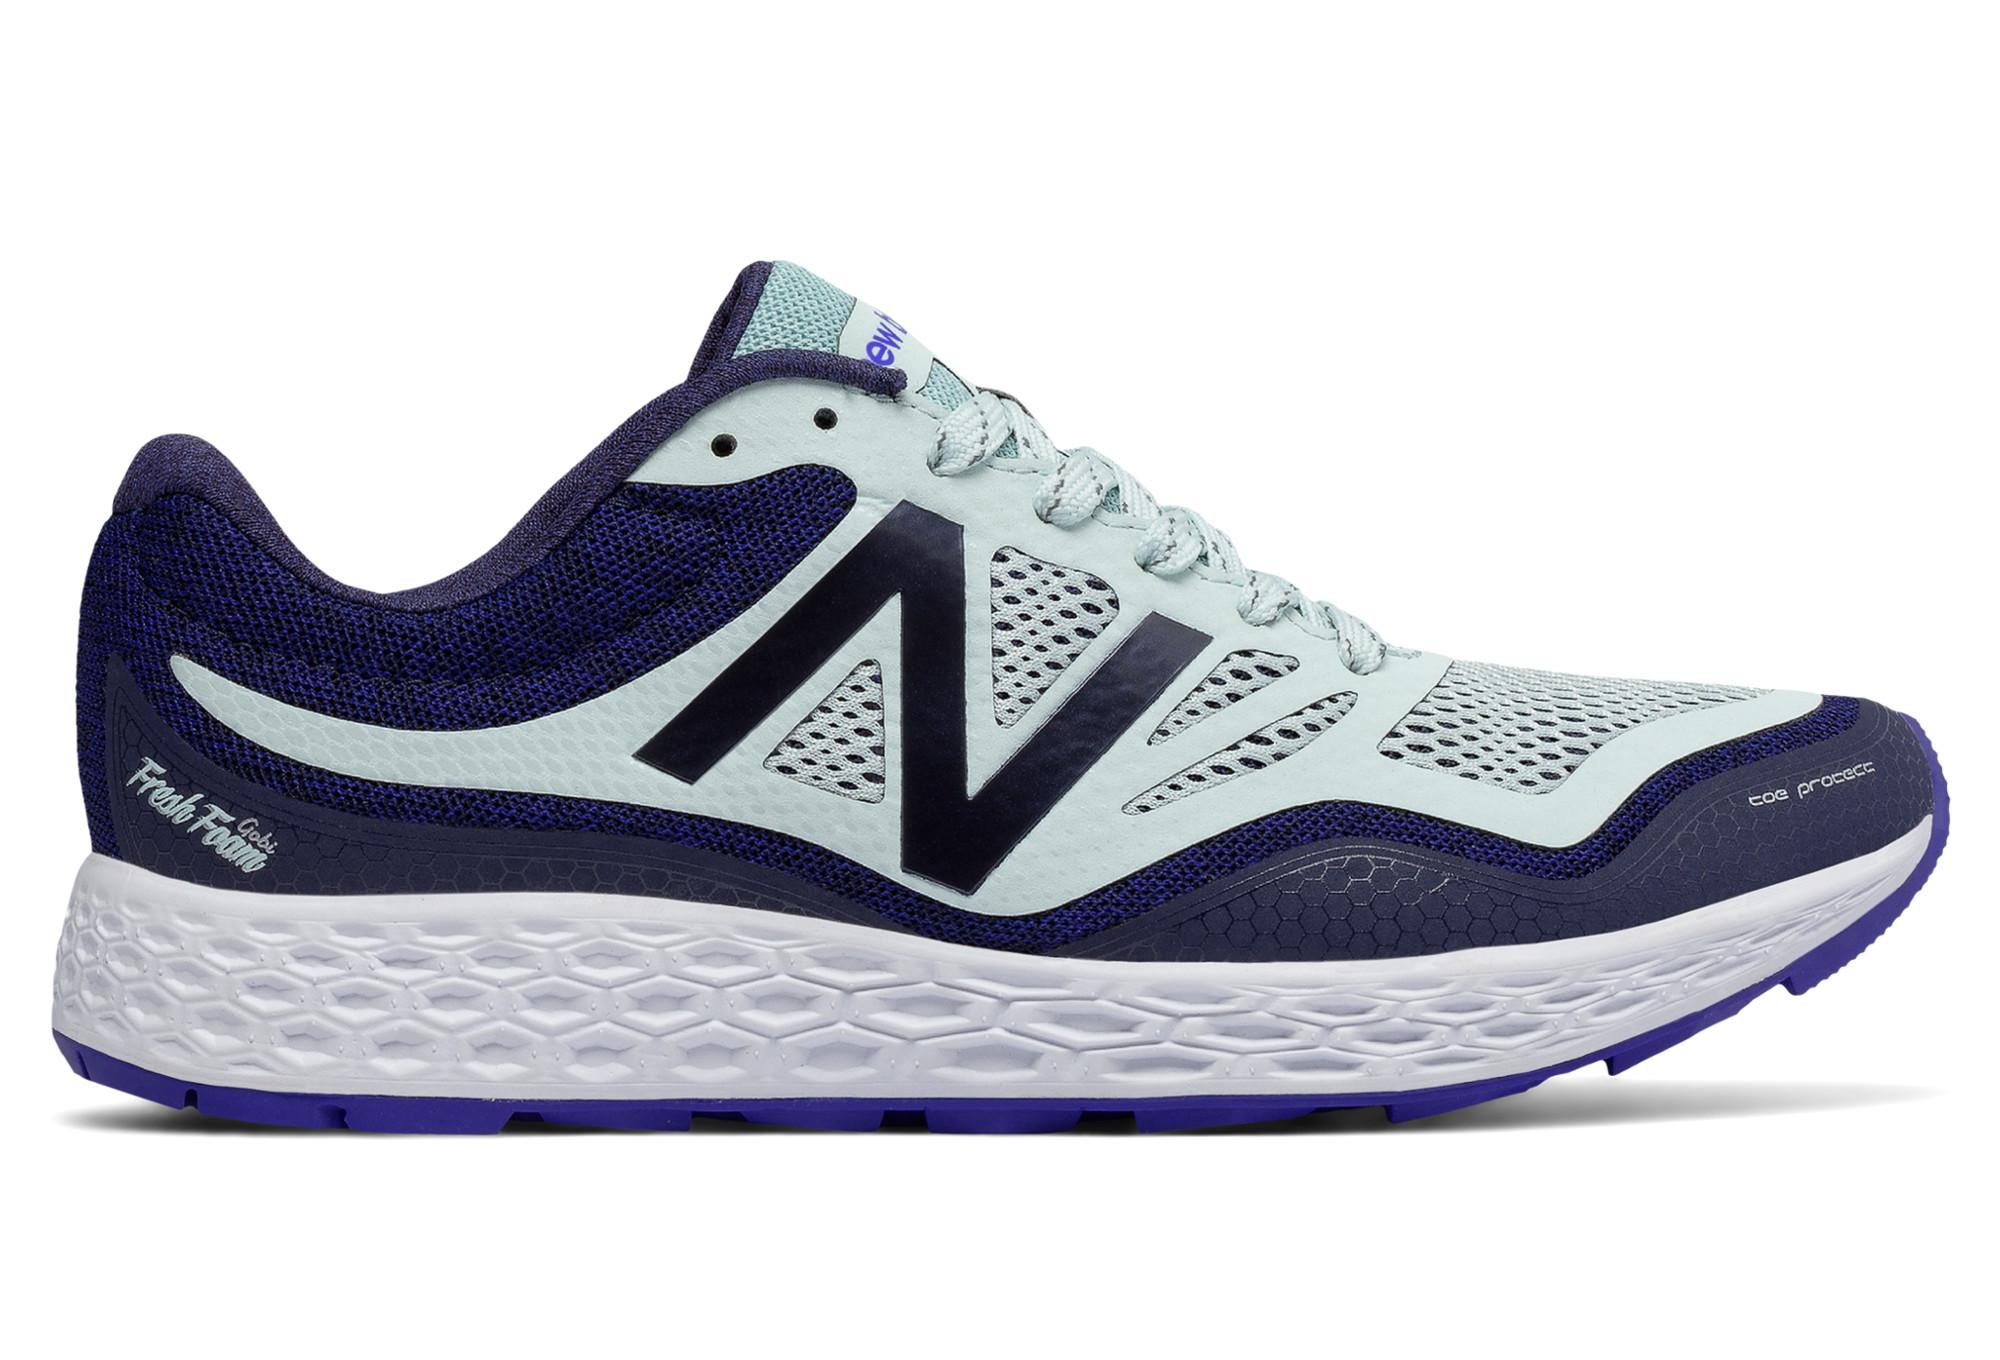 New Balance Shoes Trail Running Mtb